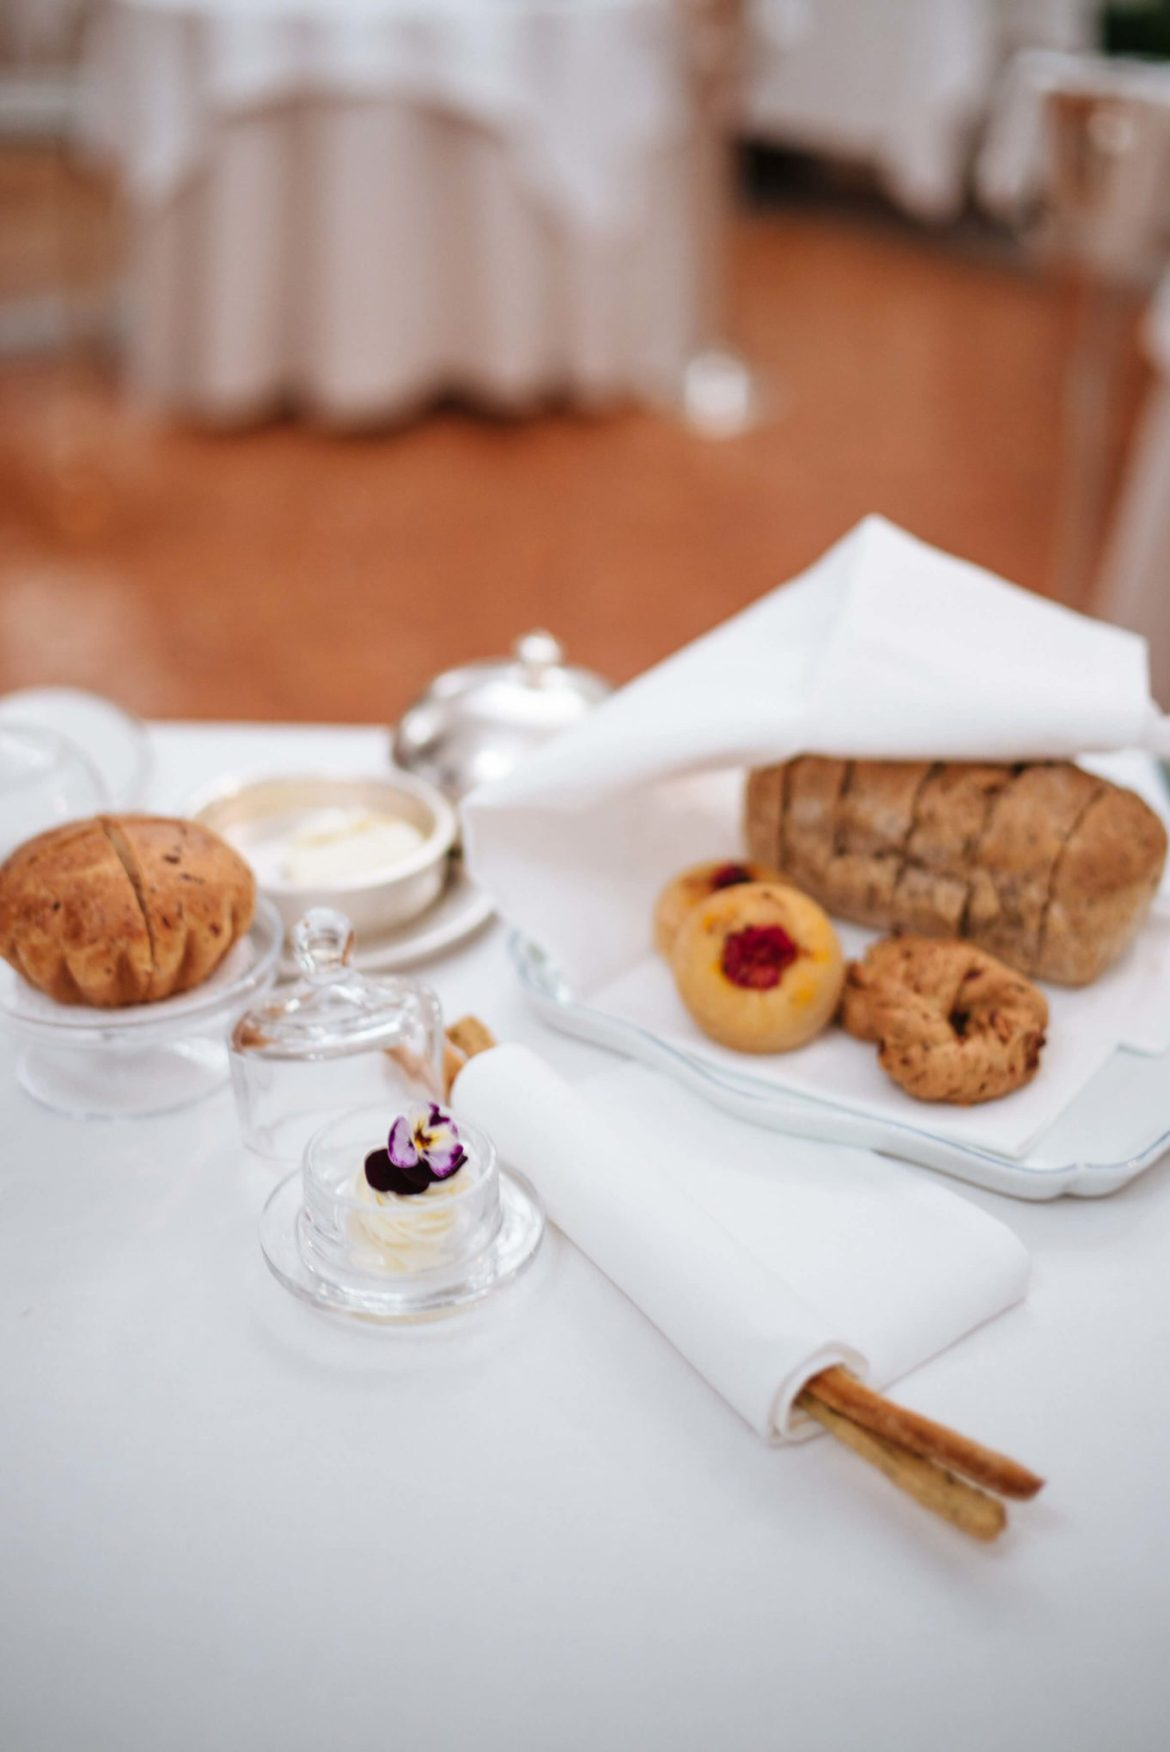 Bread ay Rossellini's Restaurant in Palazzo Avino, Ravello Italy, The Taste Edit